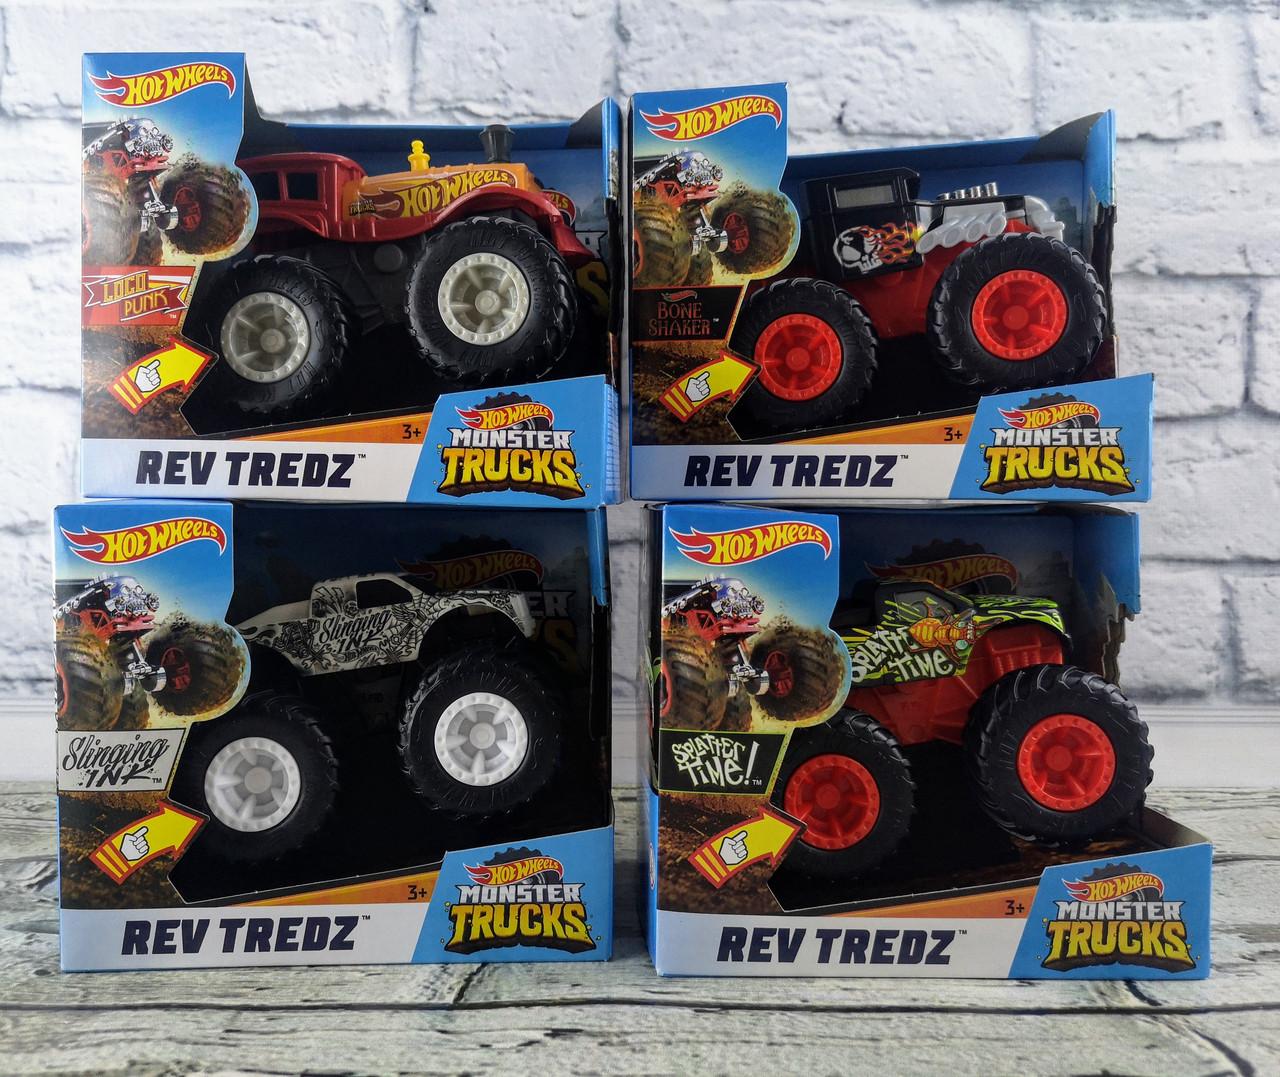 Позашляховик 1:43 Hot Wheels Monster Tracks в коробці FYJ71 Mattel